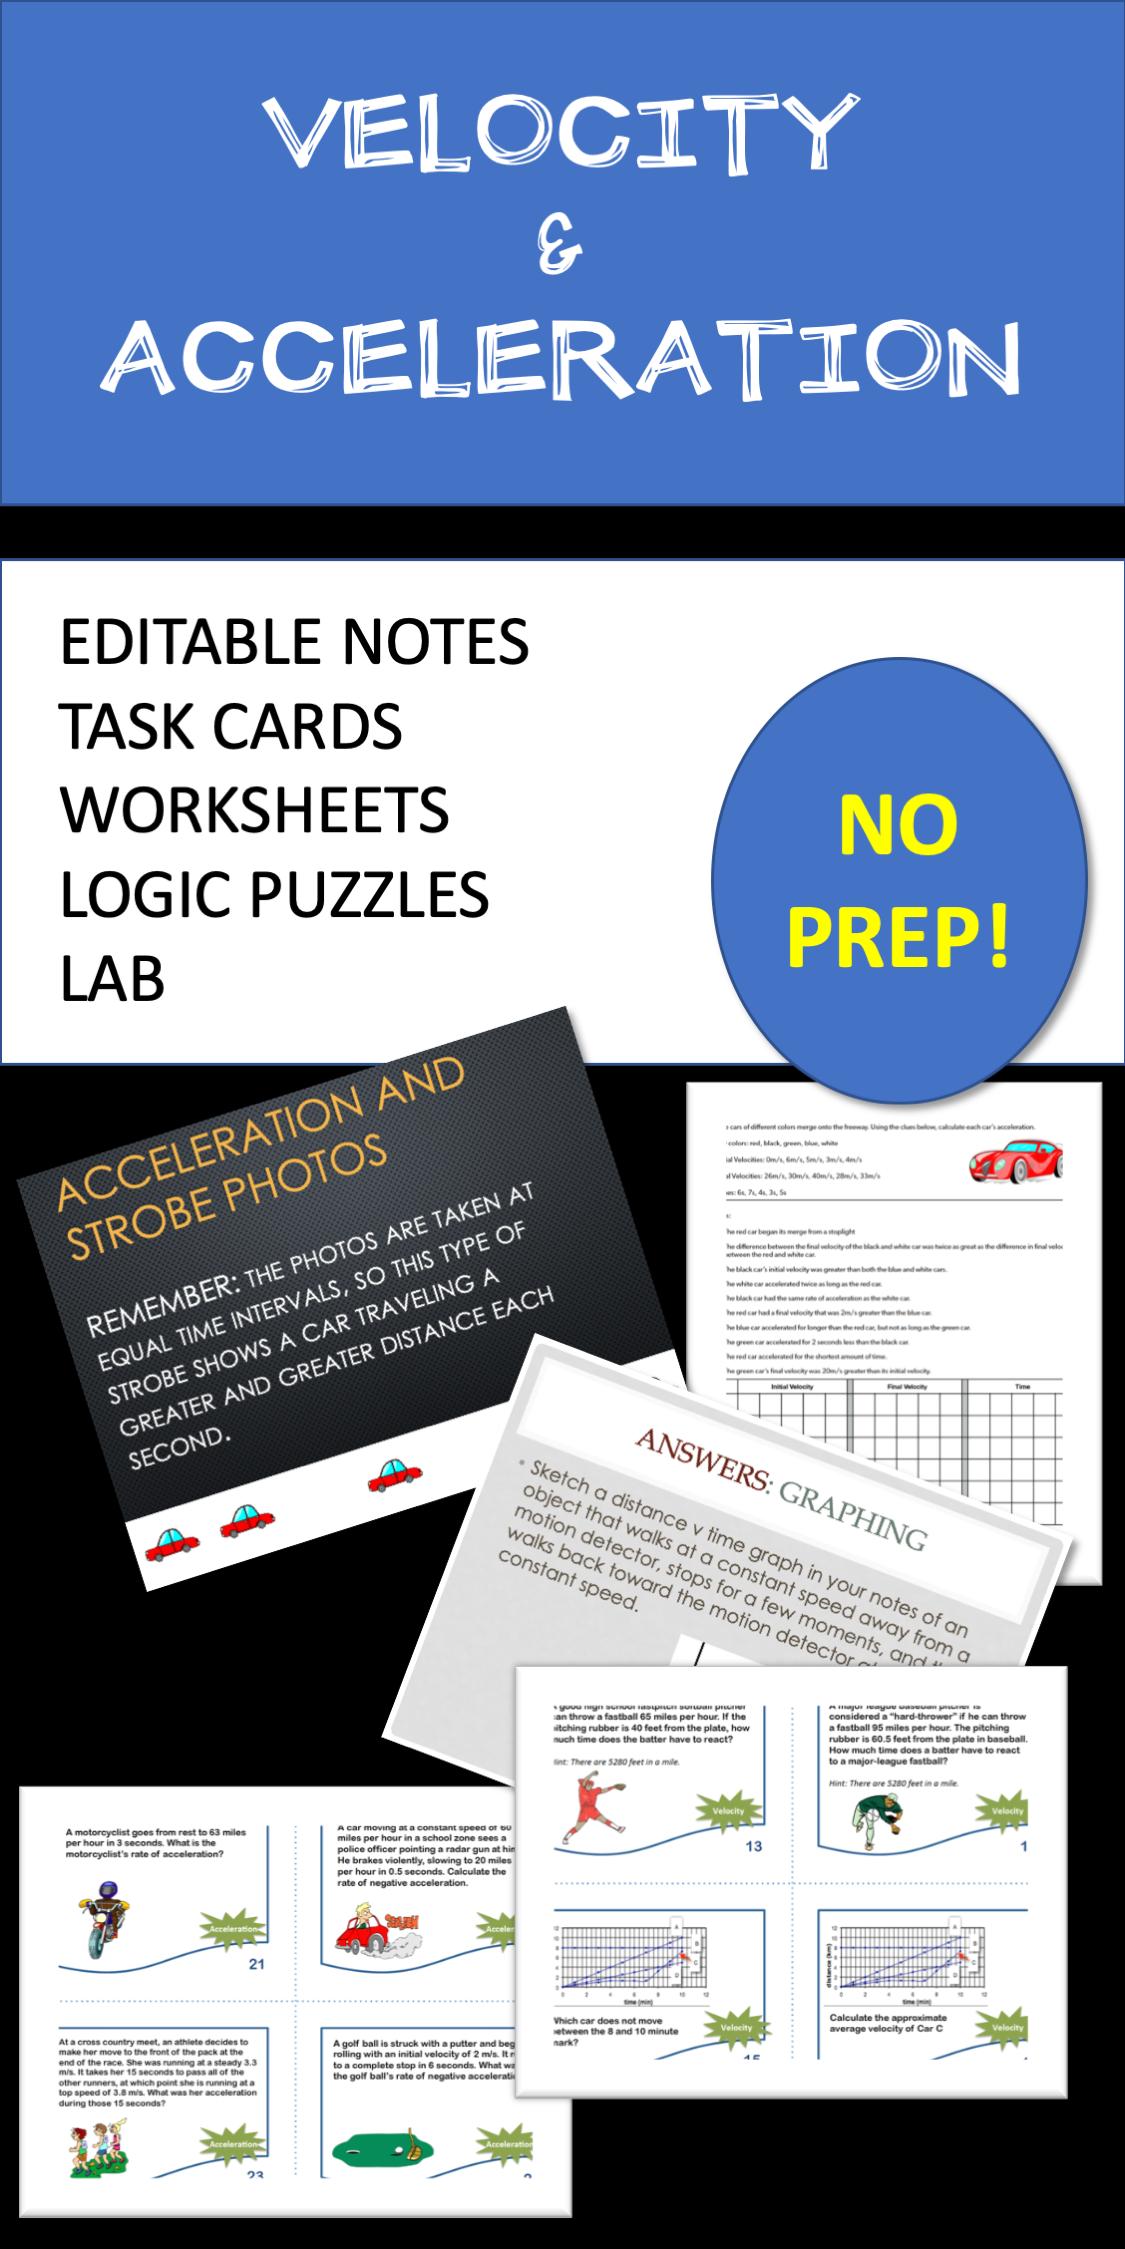 hight resolution of Velocity \u0026 Acceleration: Editable Notes